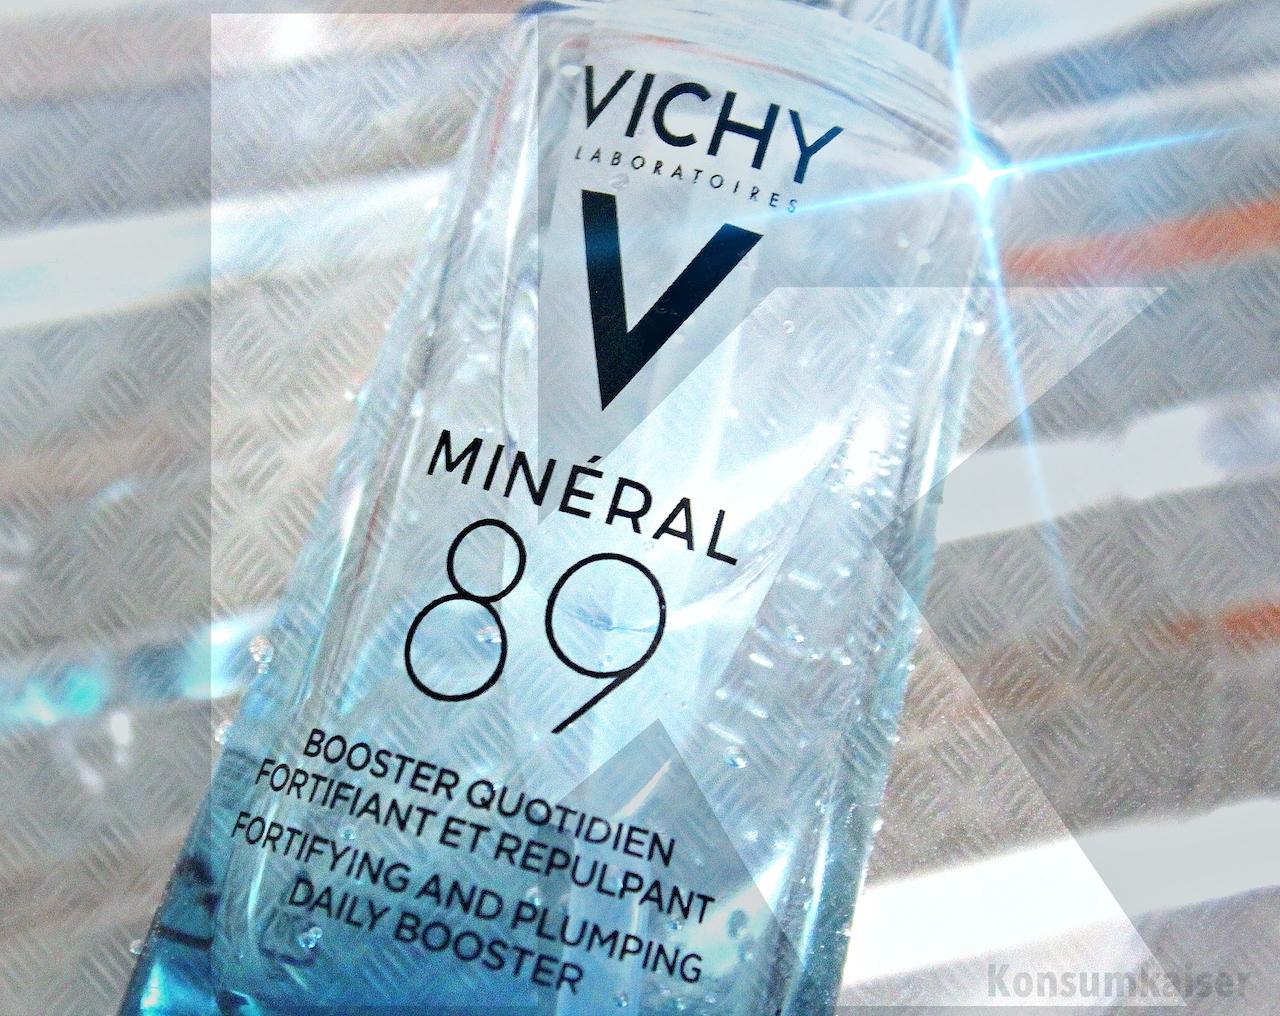 "SKINCARE: VICHY ""MINERAL 89"" * EIN (SEHR SIMPLER) HYALURONBOOSTER + ALTERNATIVE"